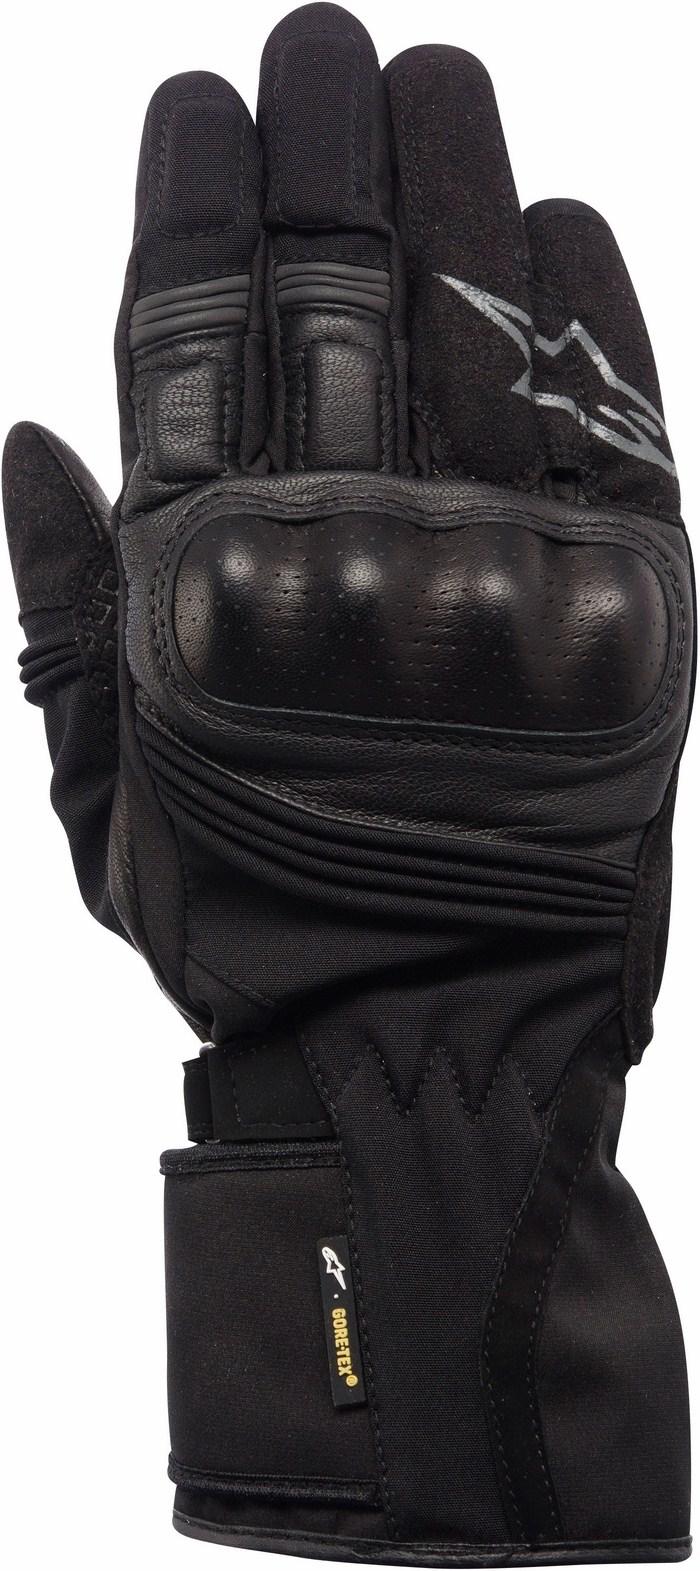 Alpinestars Transit X-Trafit gloves black